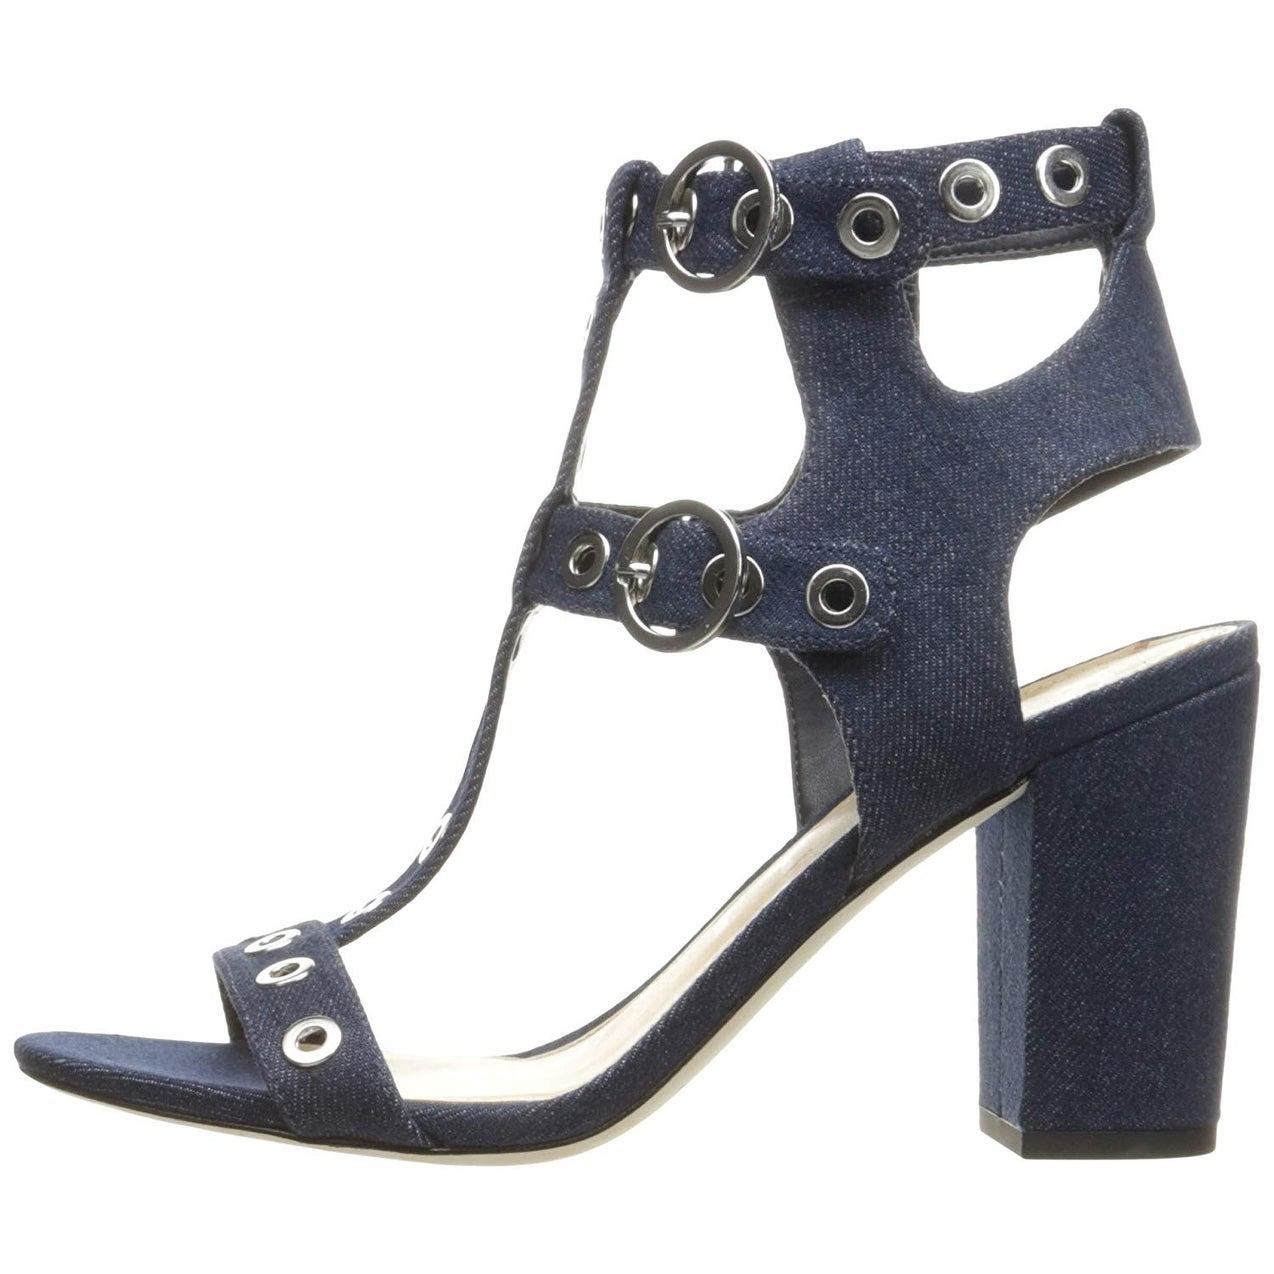 8dc6b13732656 Shop Sam Edelman Women s Eyda Dress Sandal - navy chambray - 9 - Free  Shipping Today - Overstock.com - 25635026